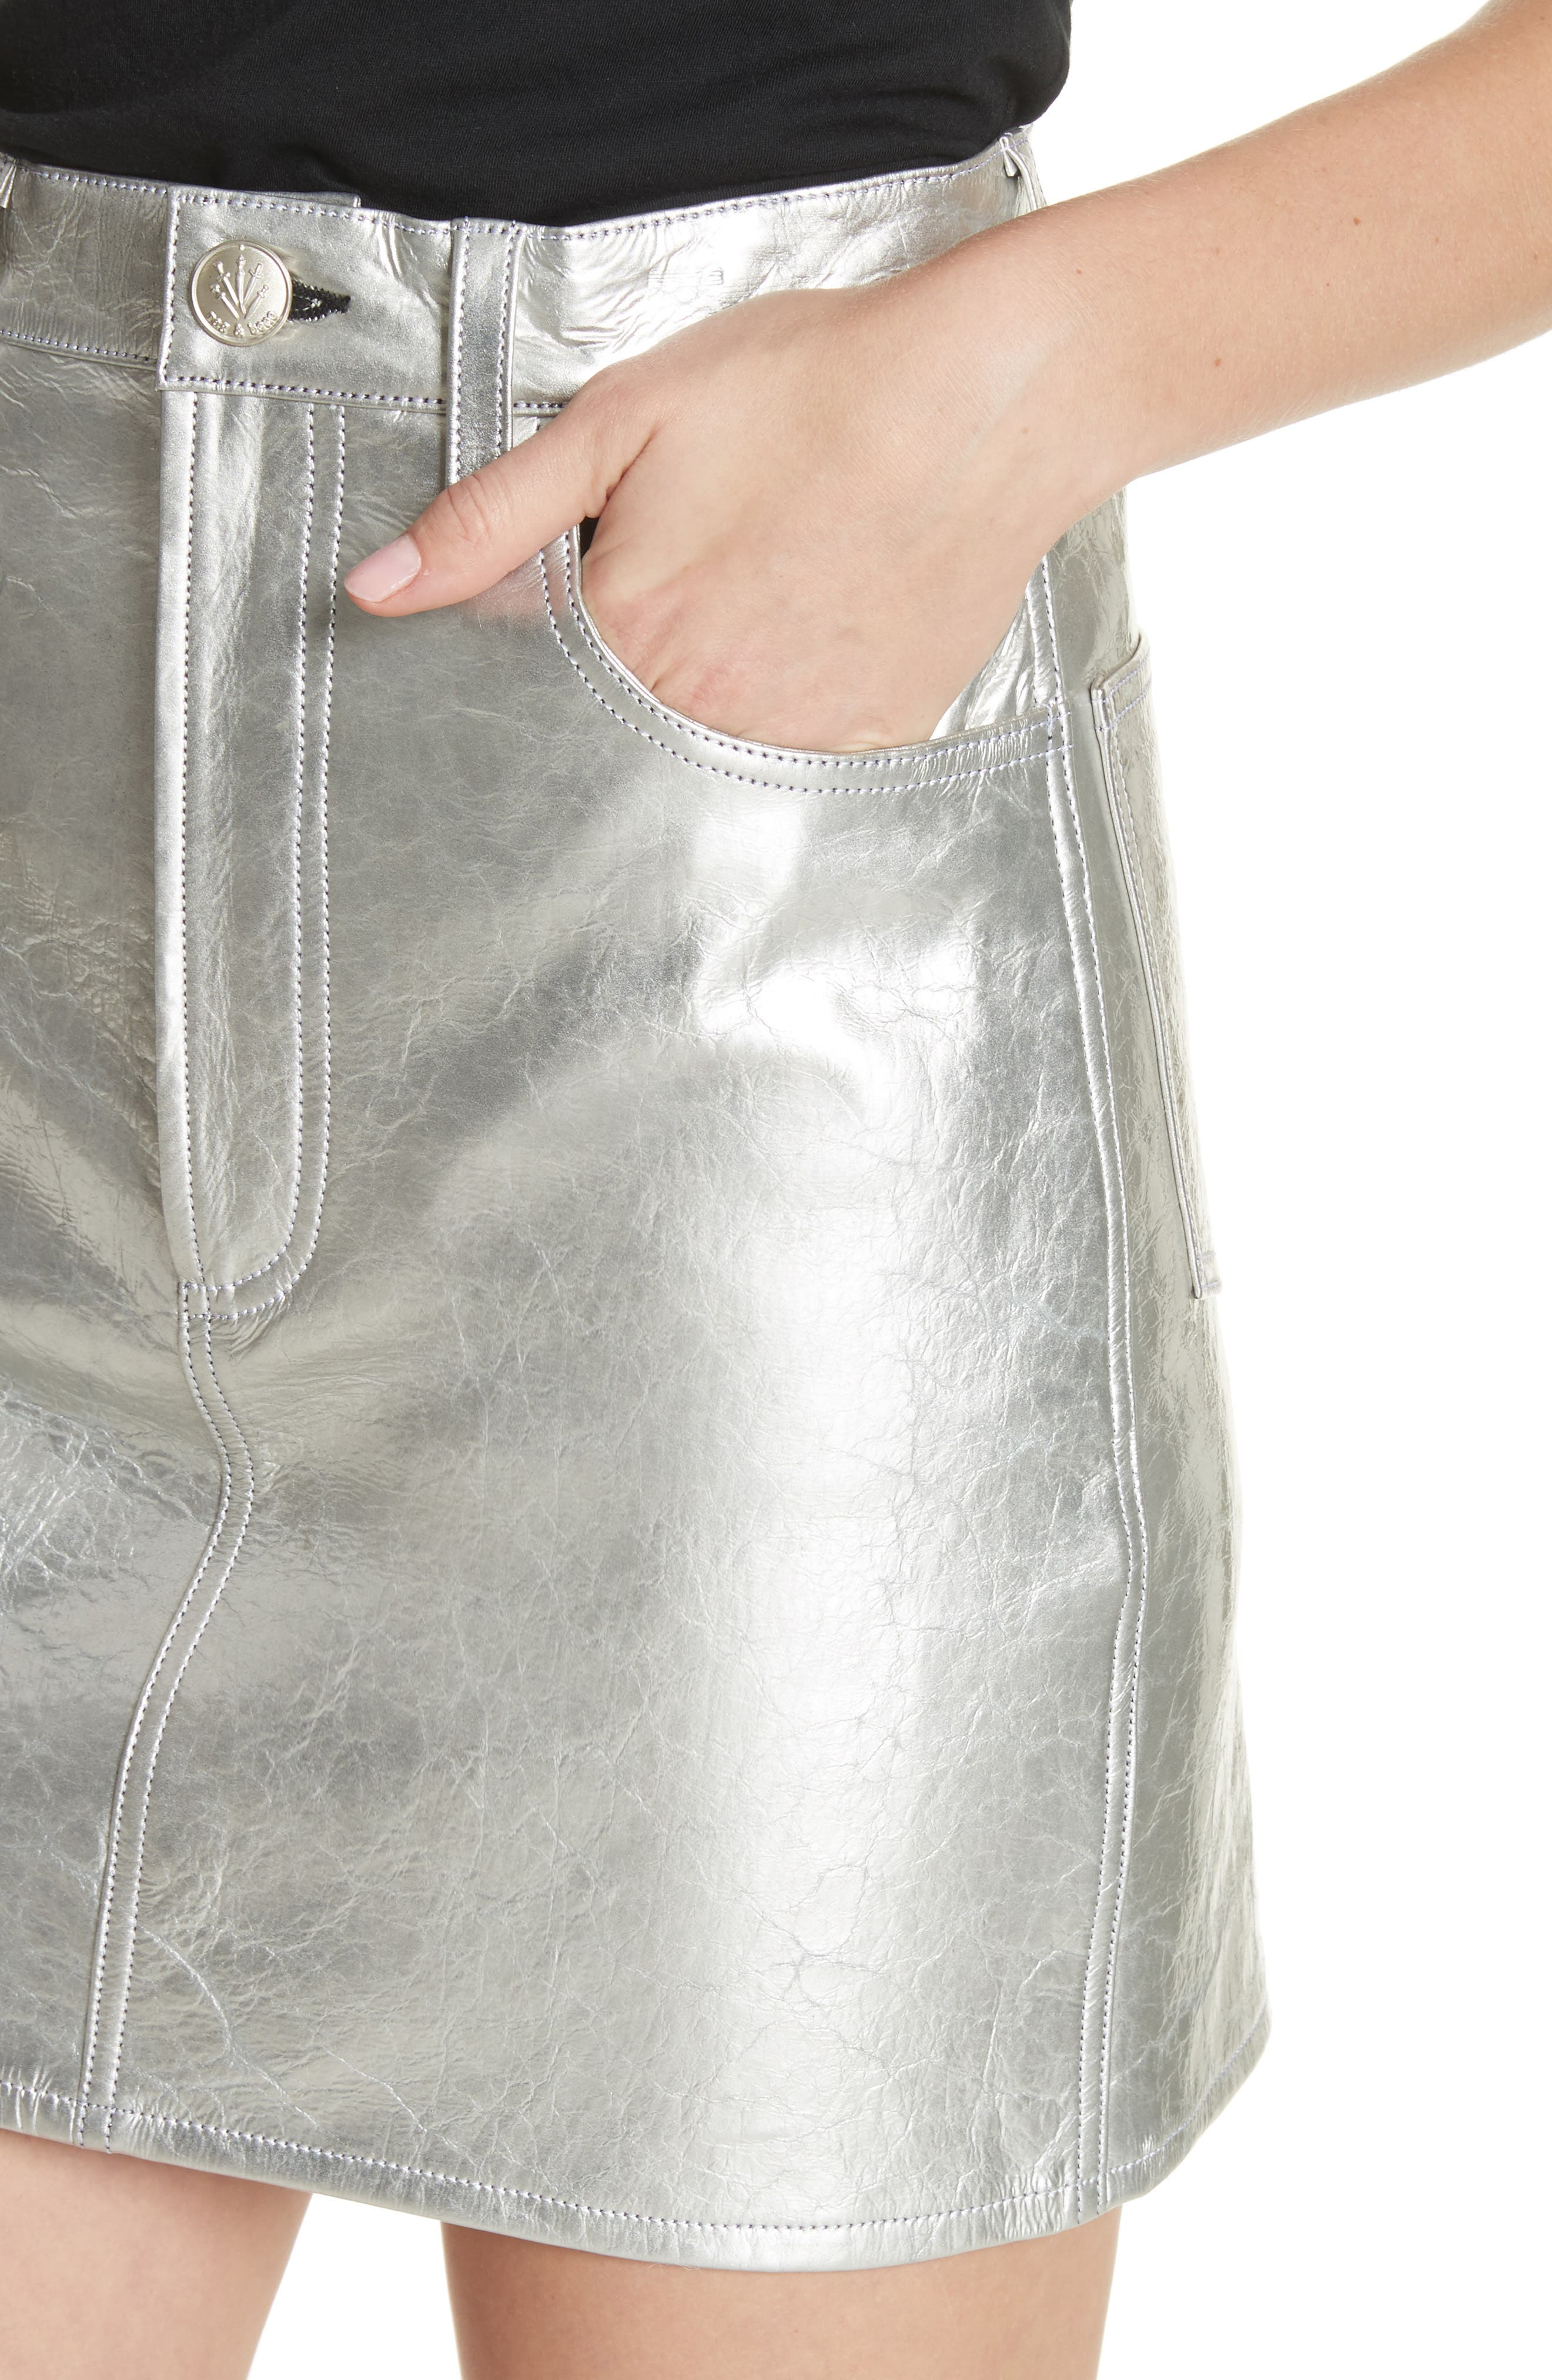 Moss High Waist Leather Miniskirt,                             Alternate thumbnail 4, color,                             041